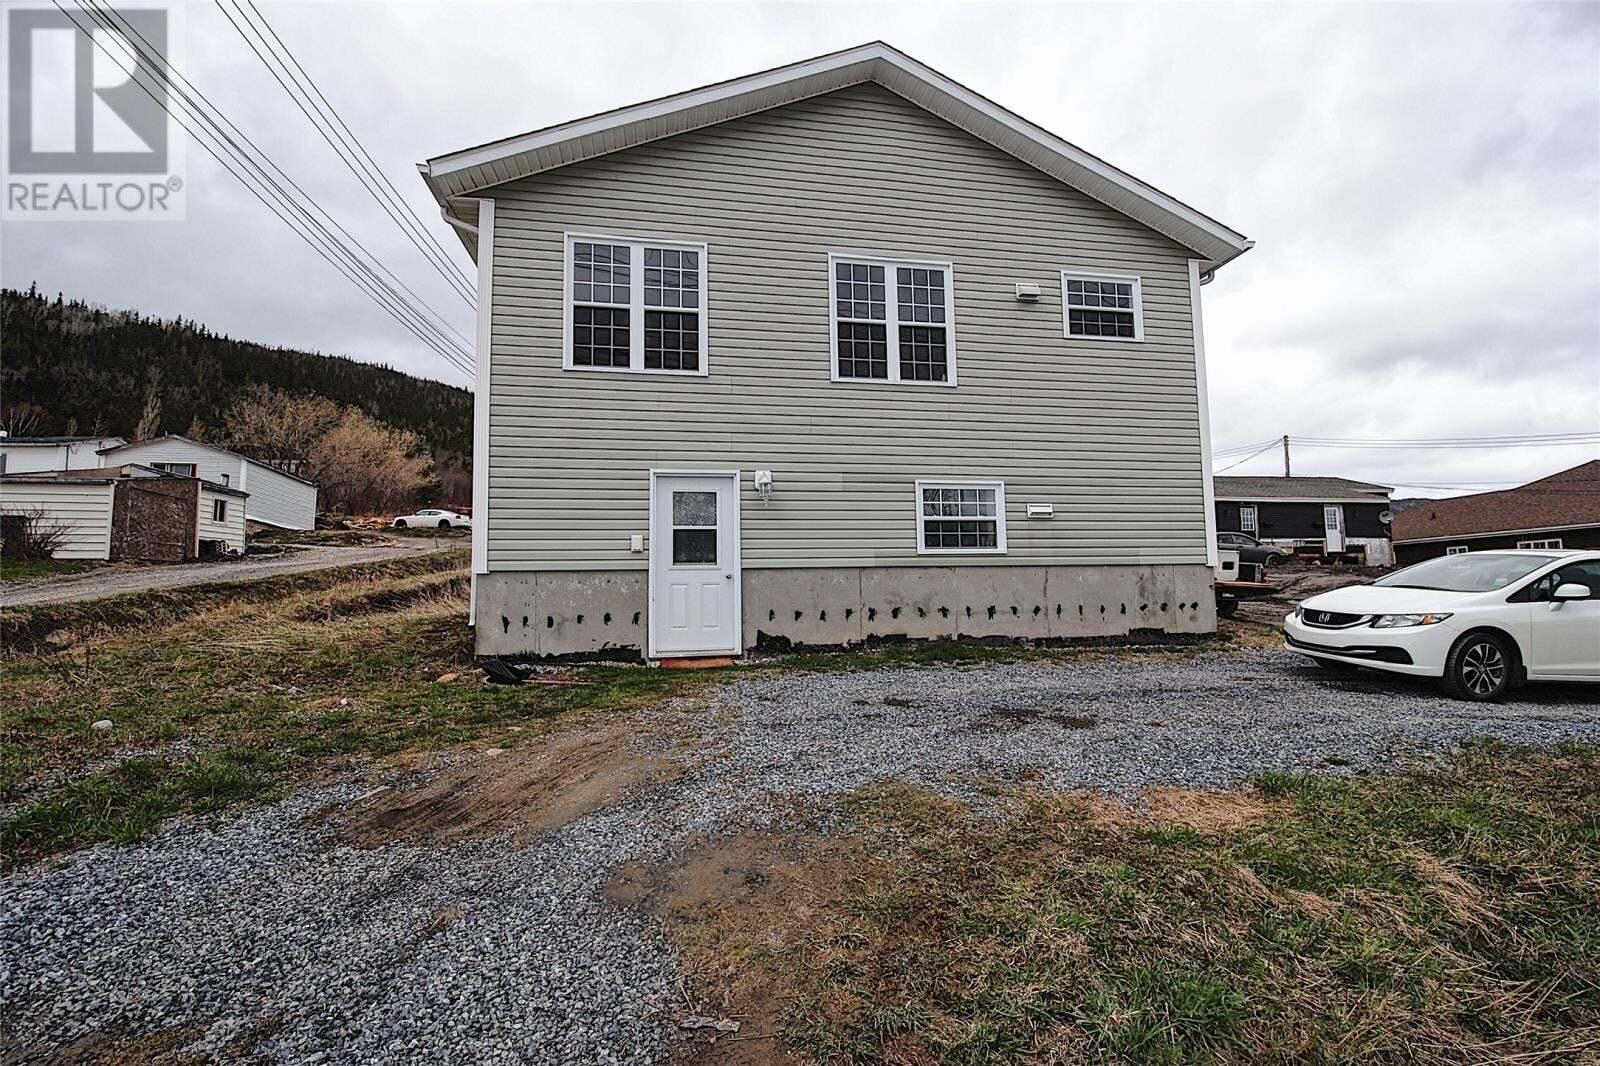 House for sale at 1 Penneys Ln Irishtown Newfoundland - MLS: 1213508